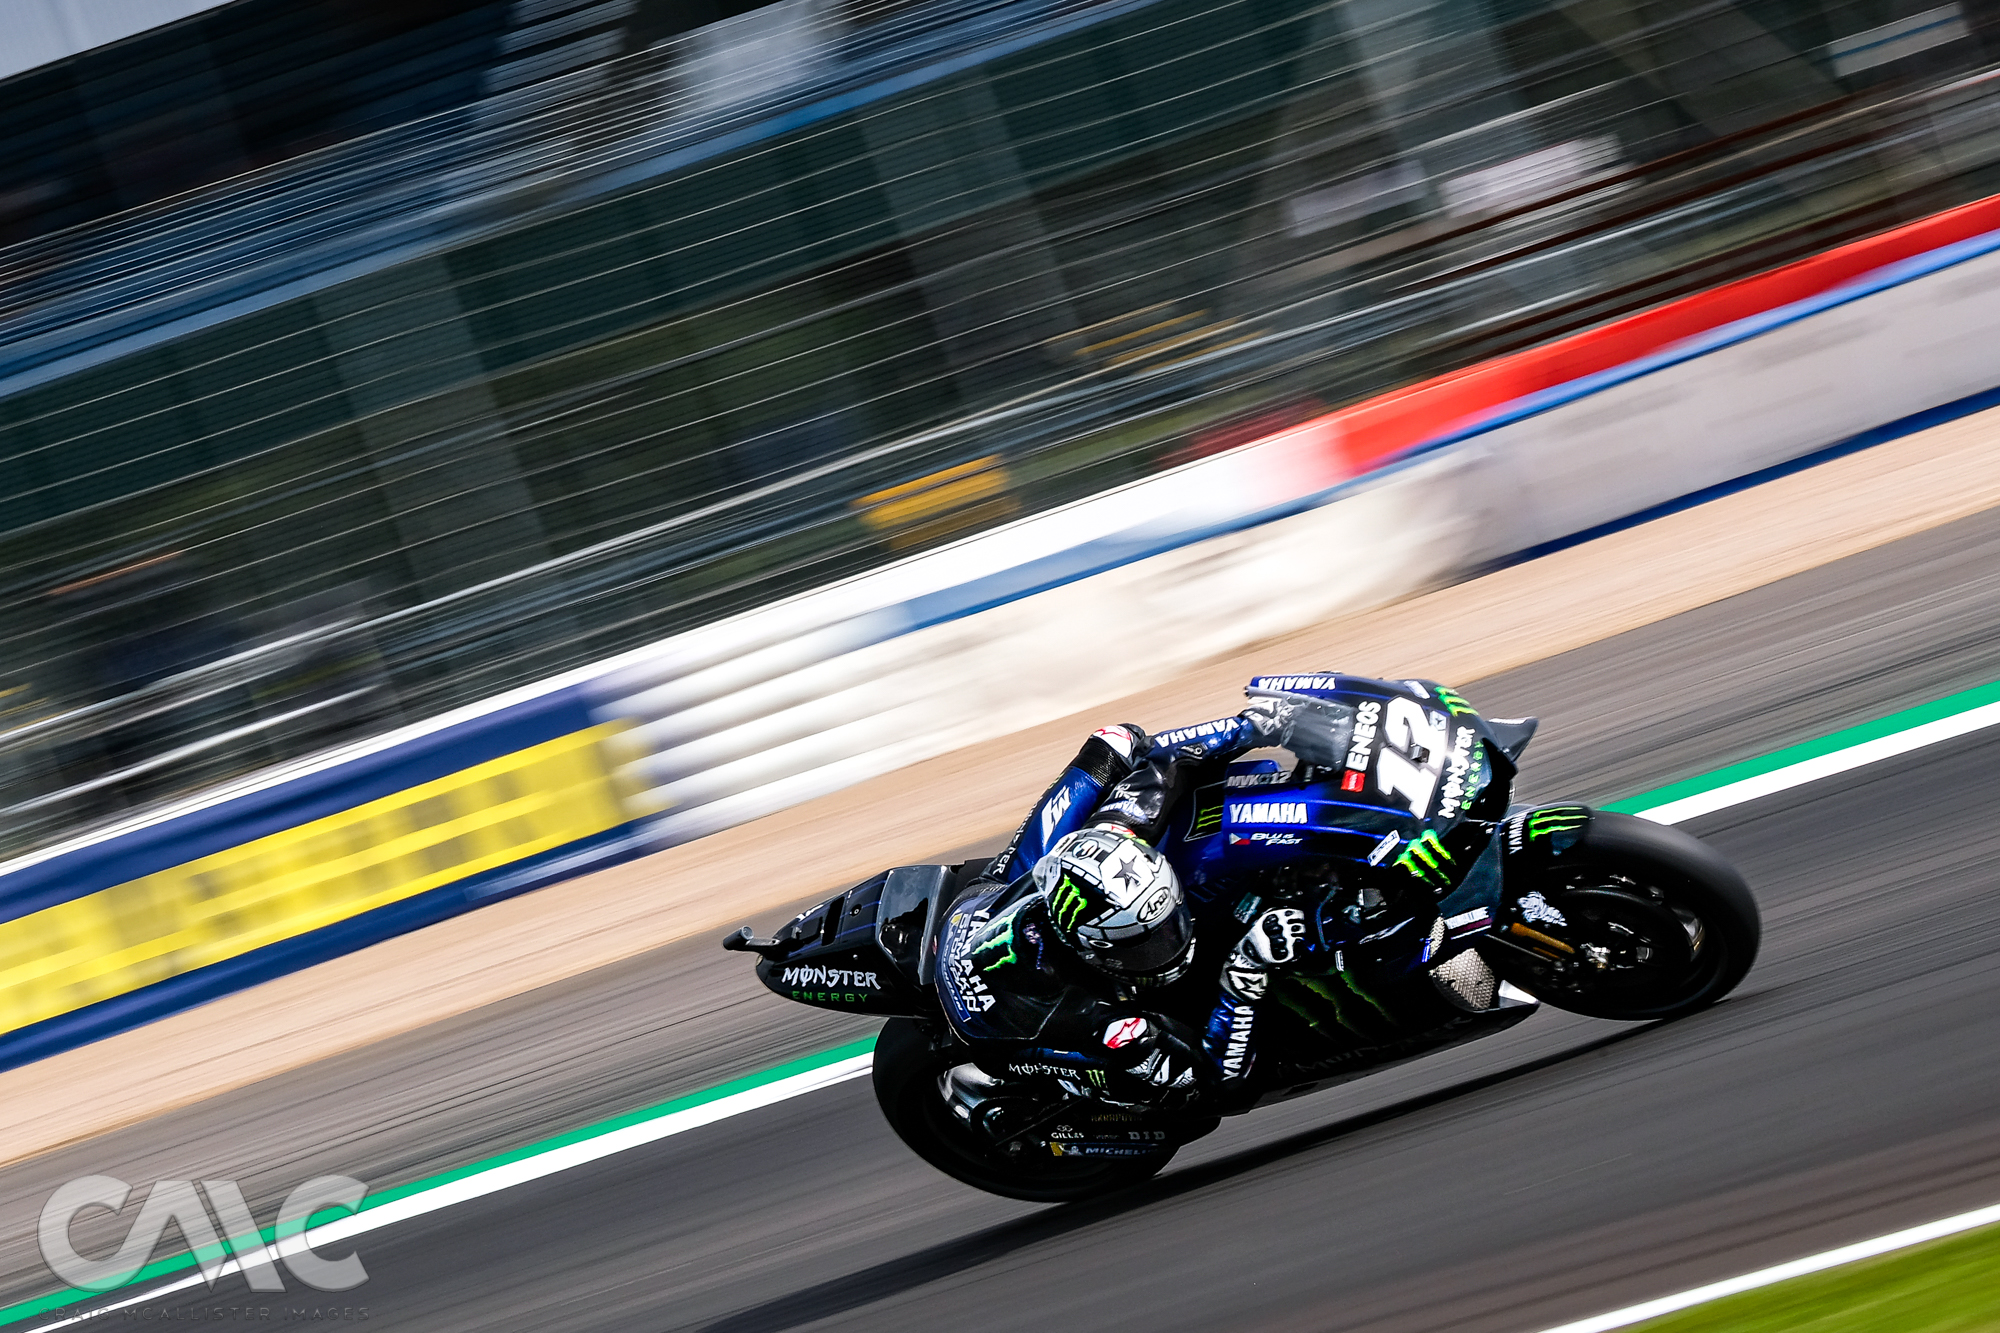 CMC_MotoGP_FP1_Silverstone 50-140389.jpg